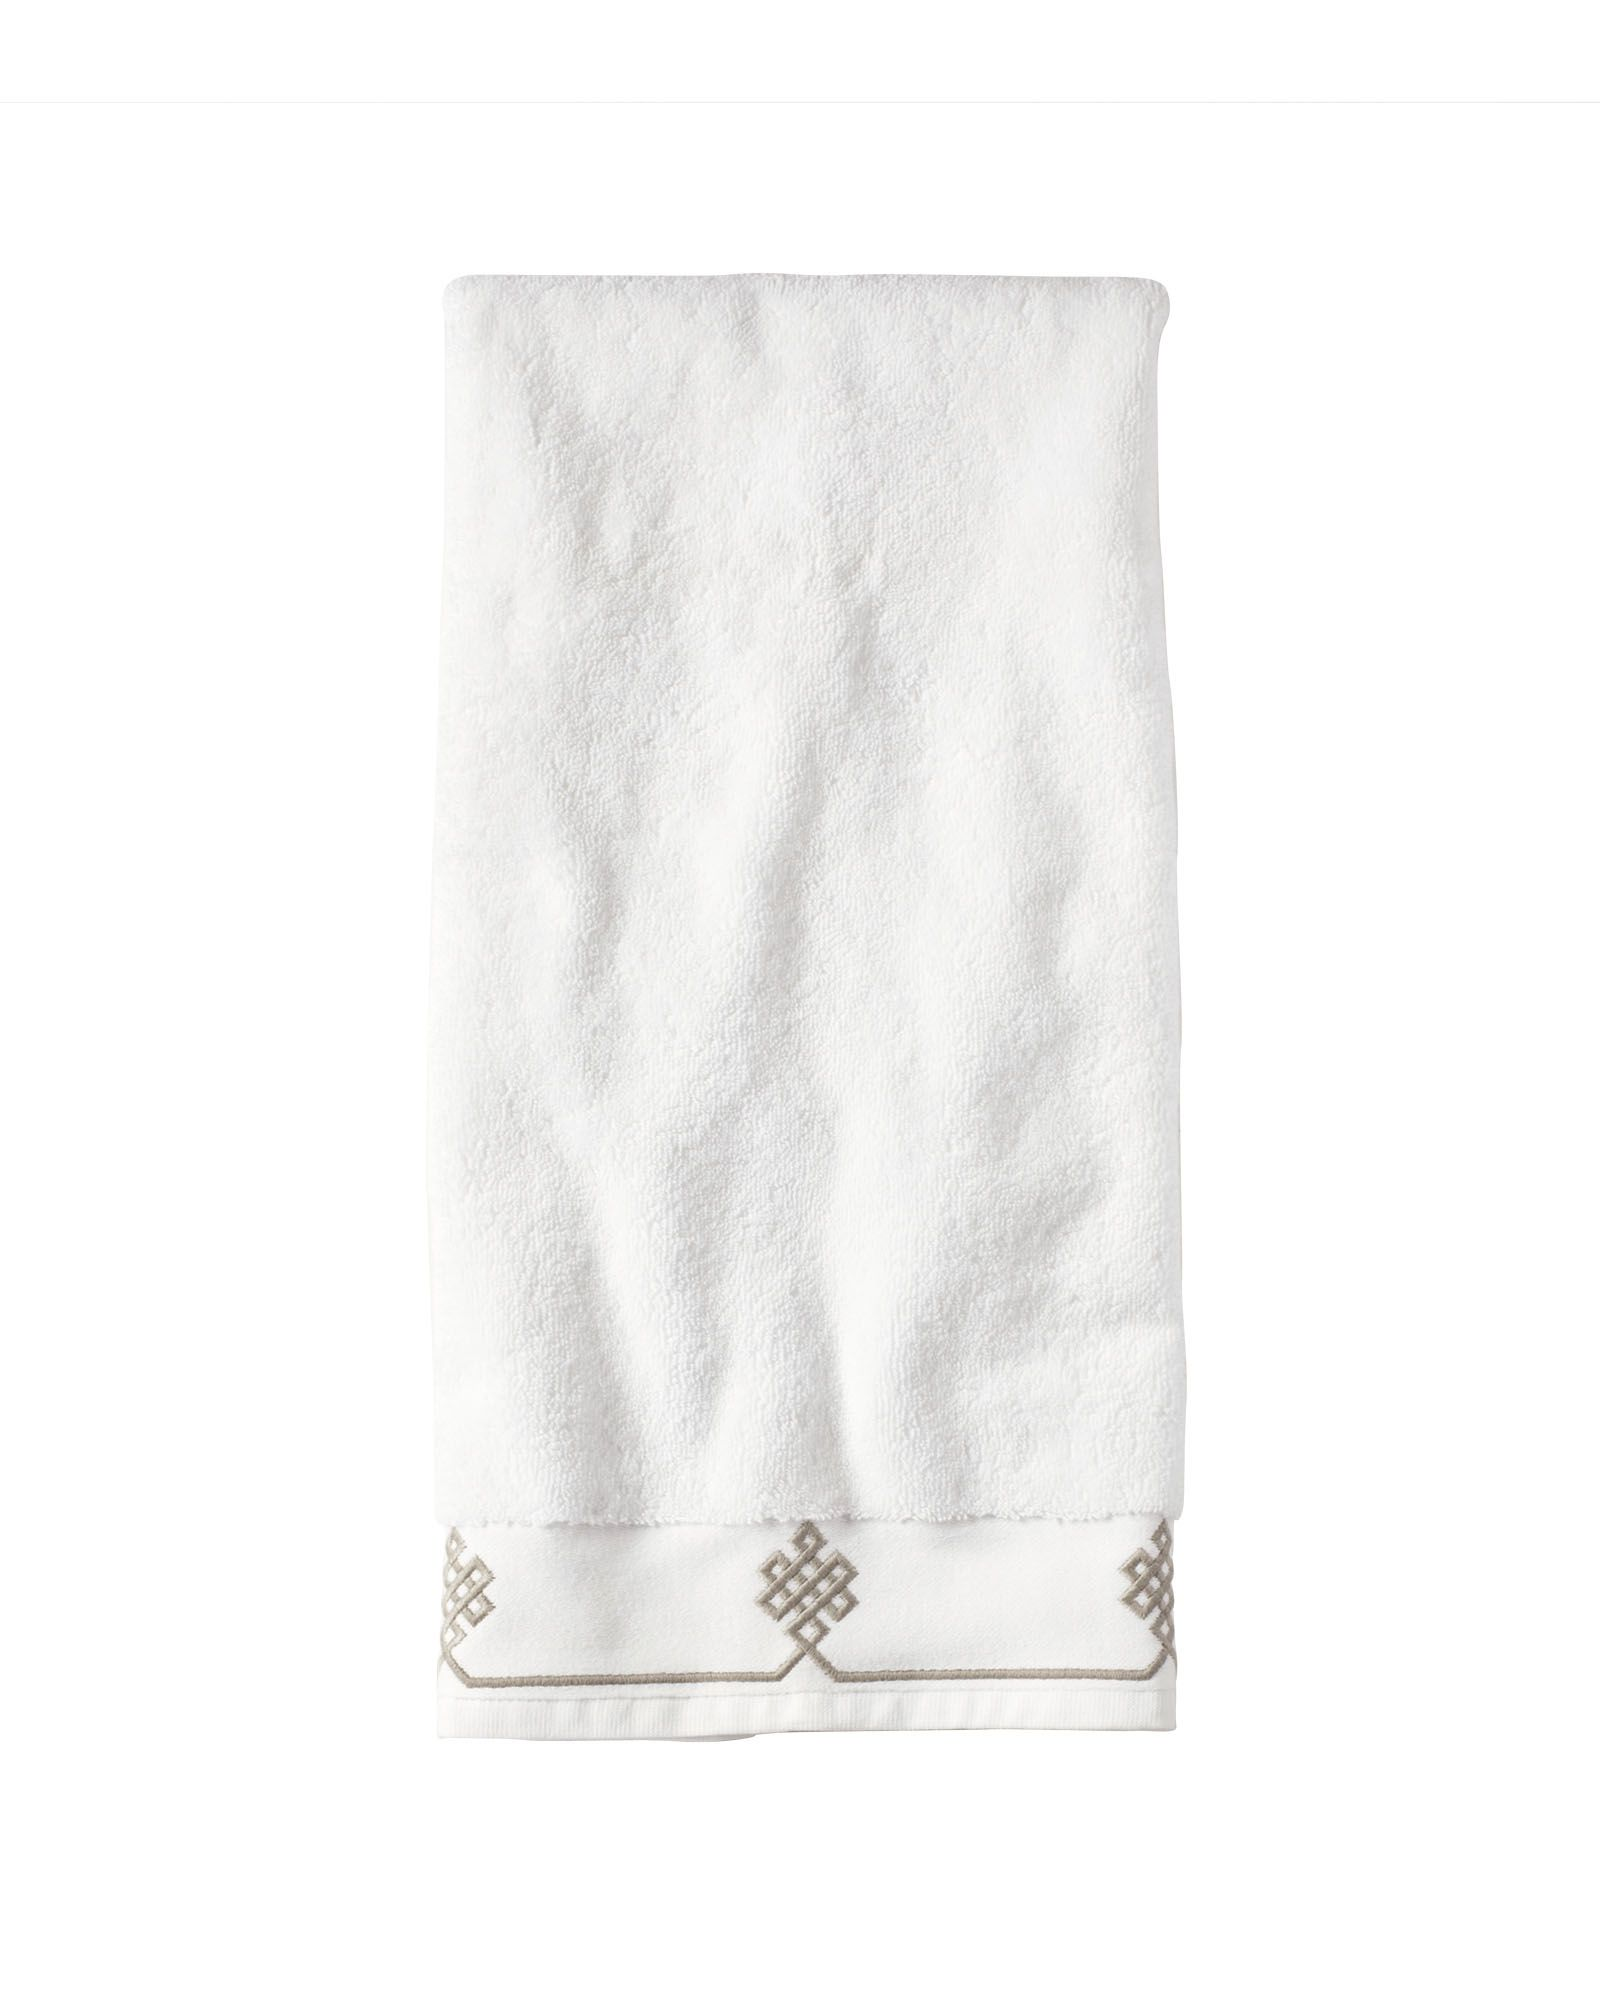 Gobi Hand TowelGobi Hand Towel